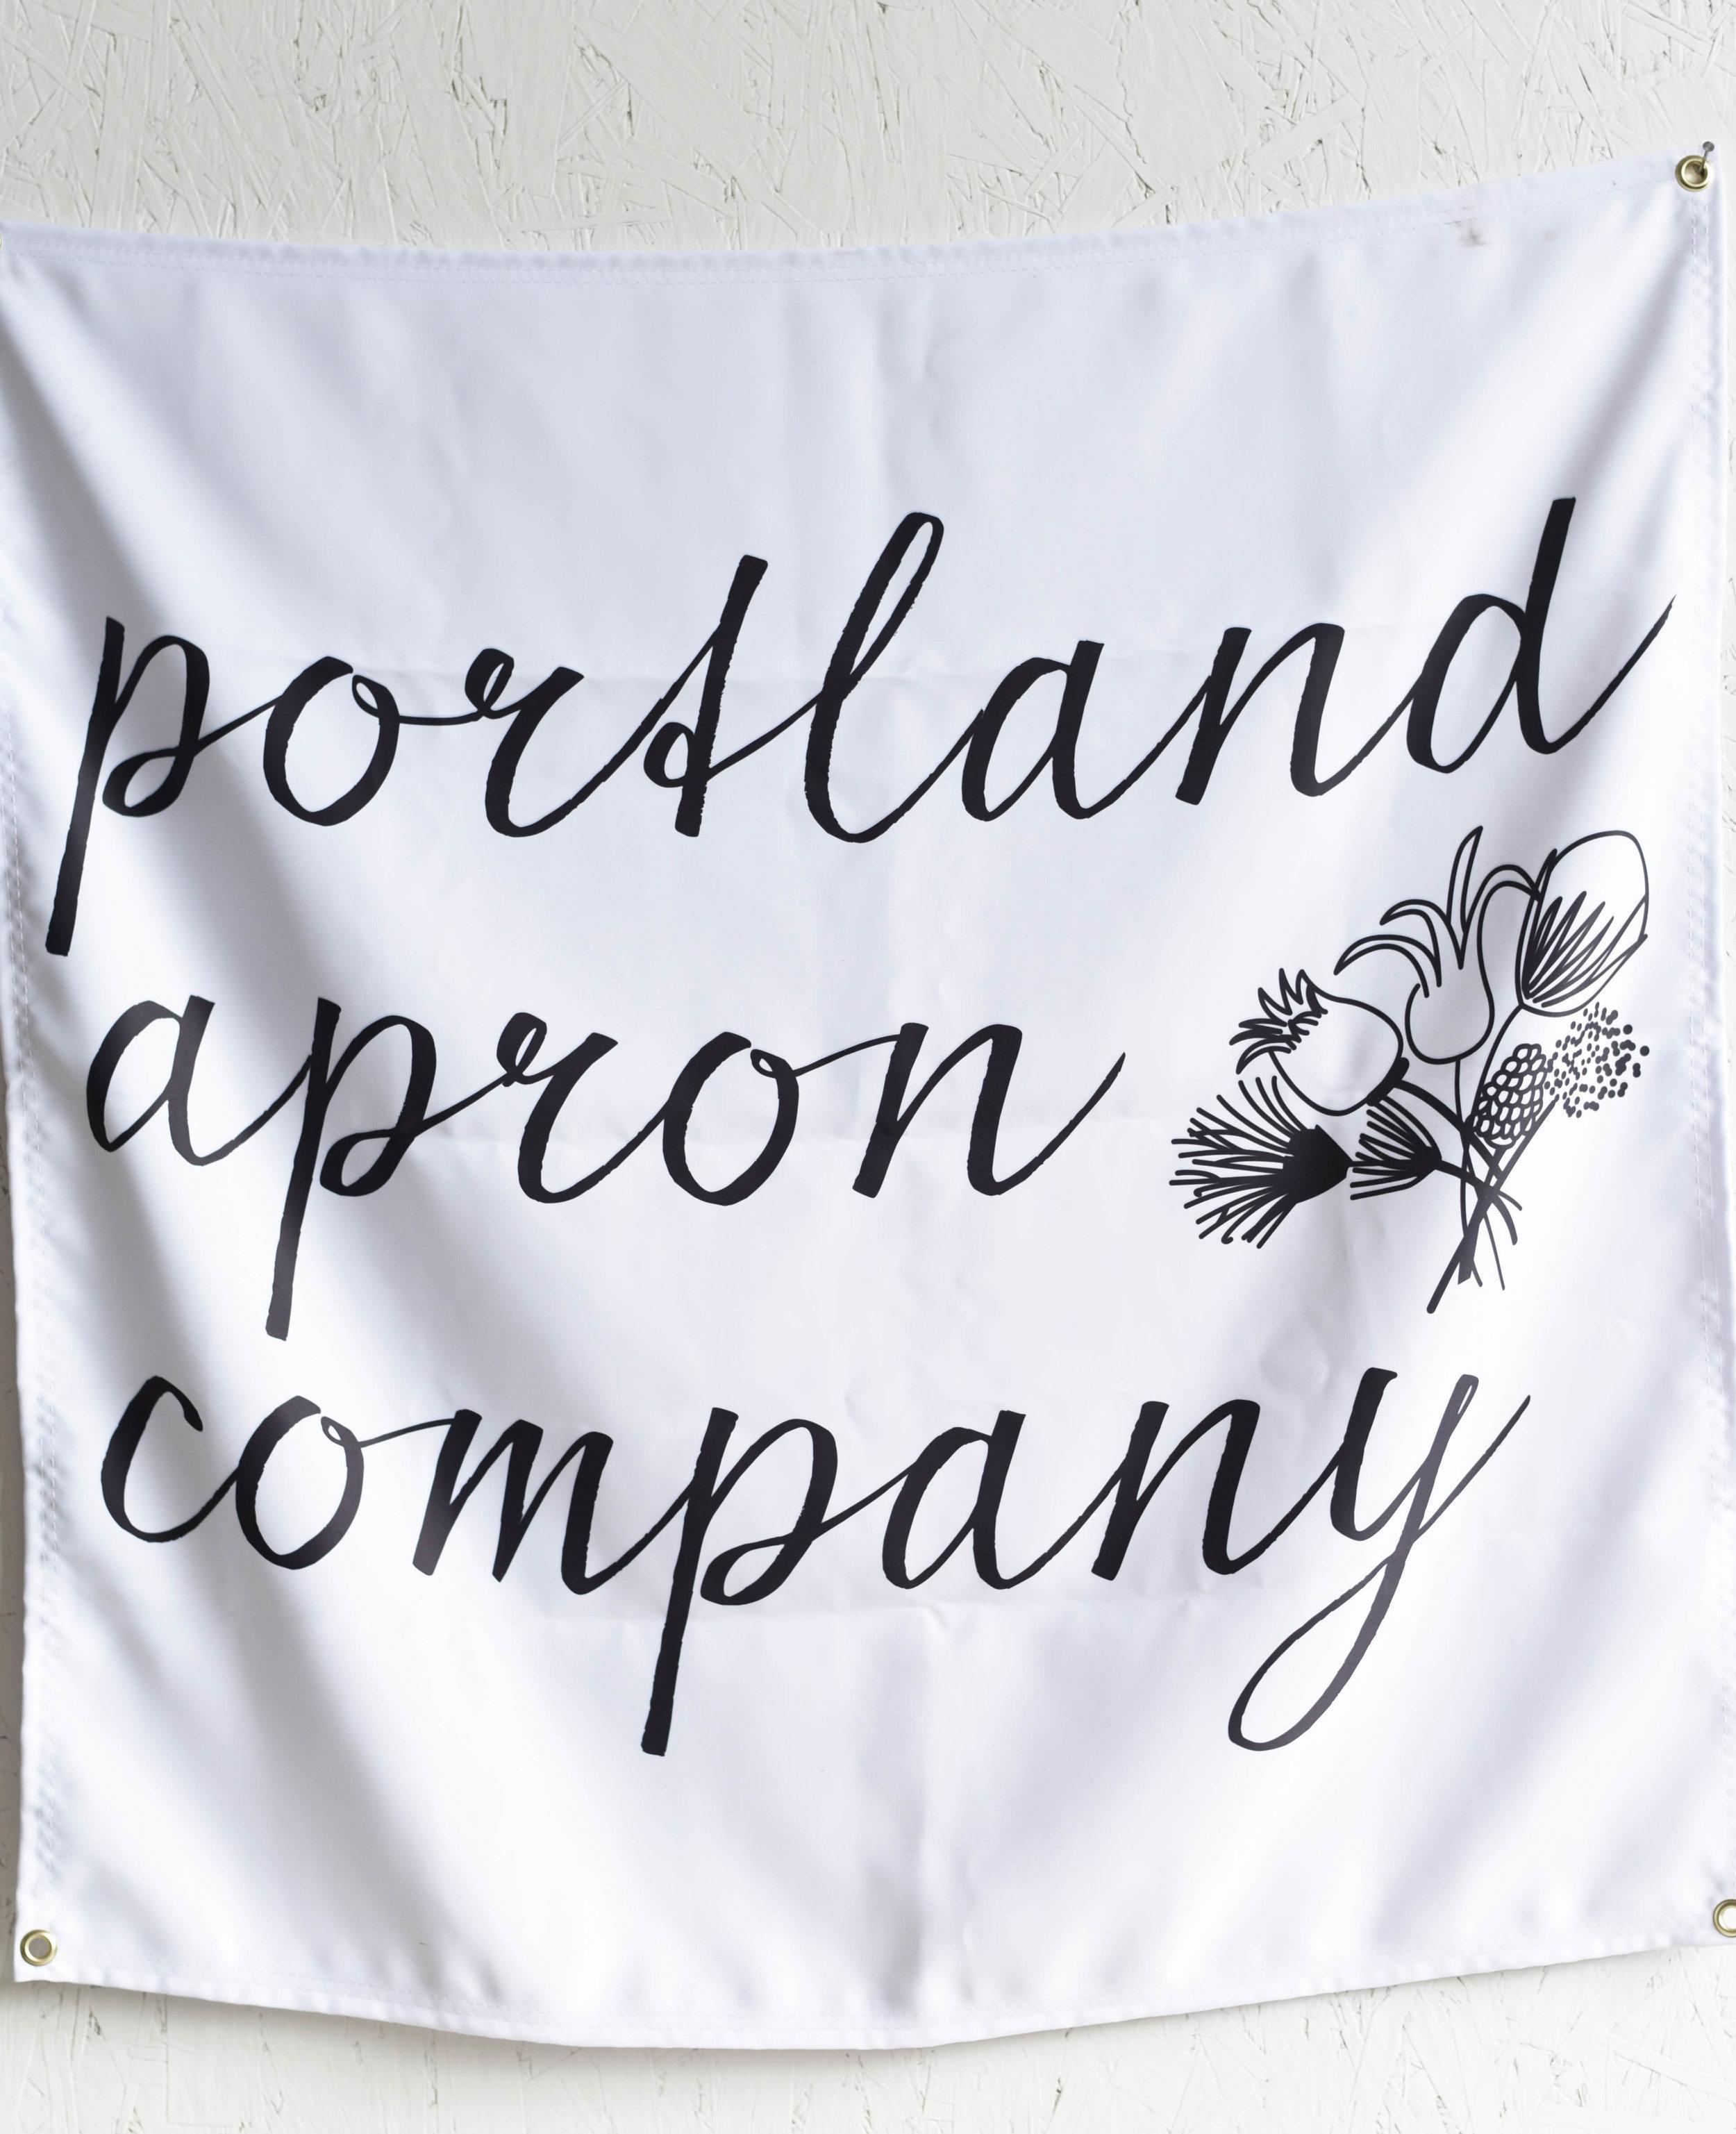 portland apron company-2.jpg